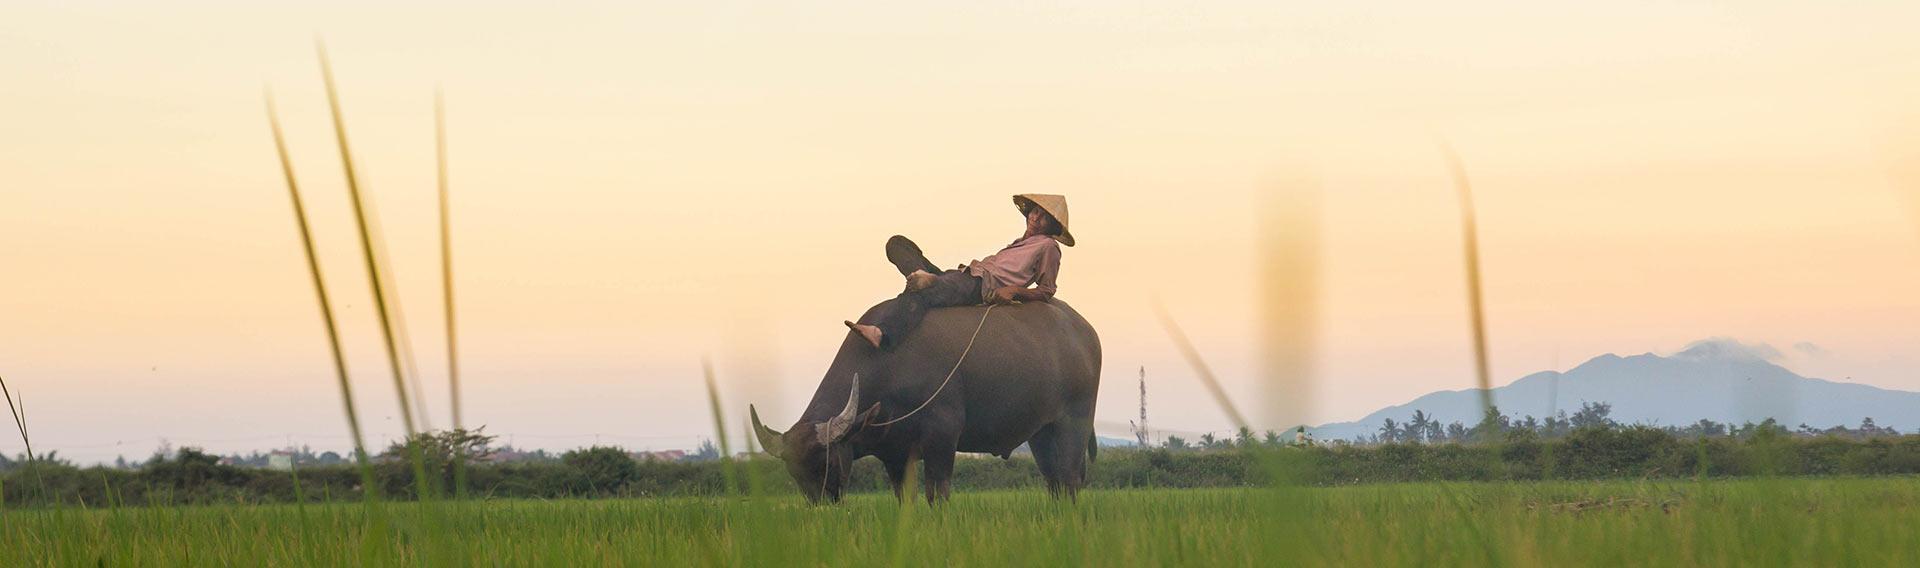 Vietnam, green landscapes